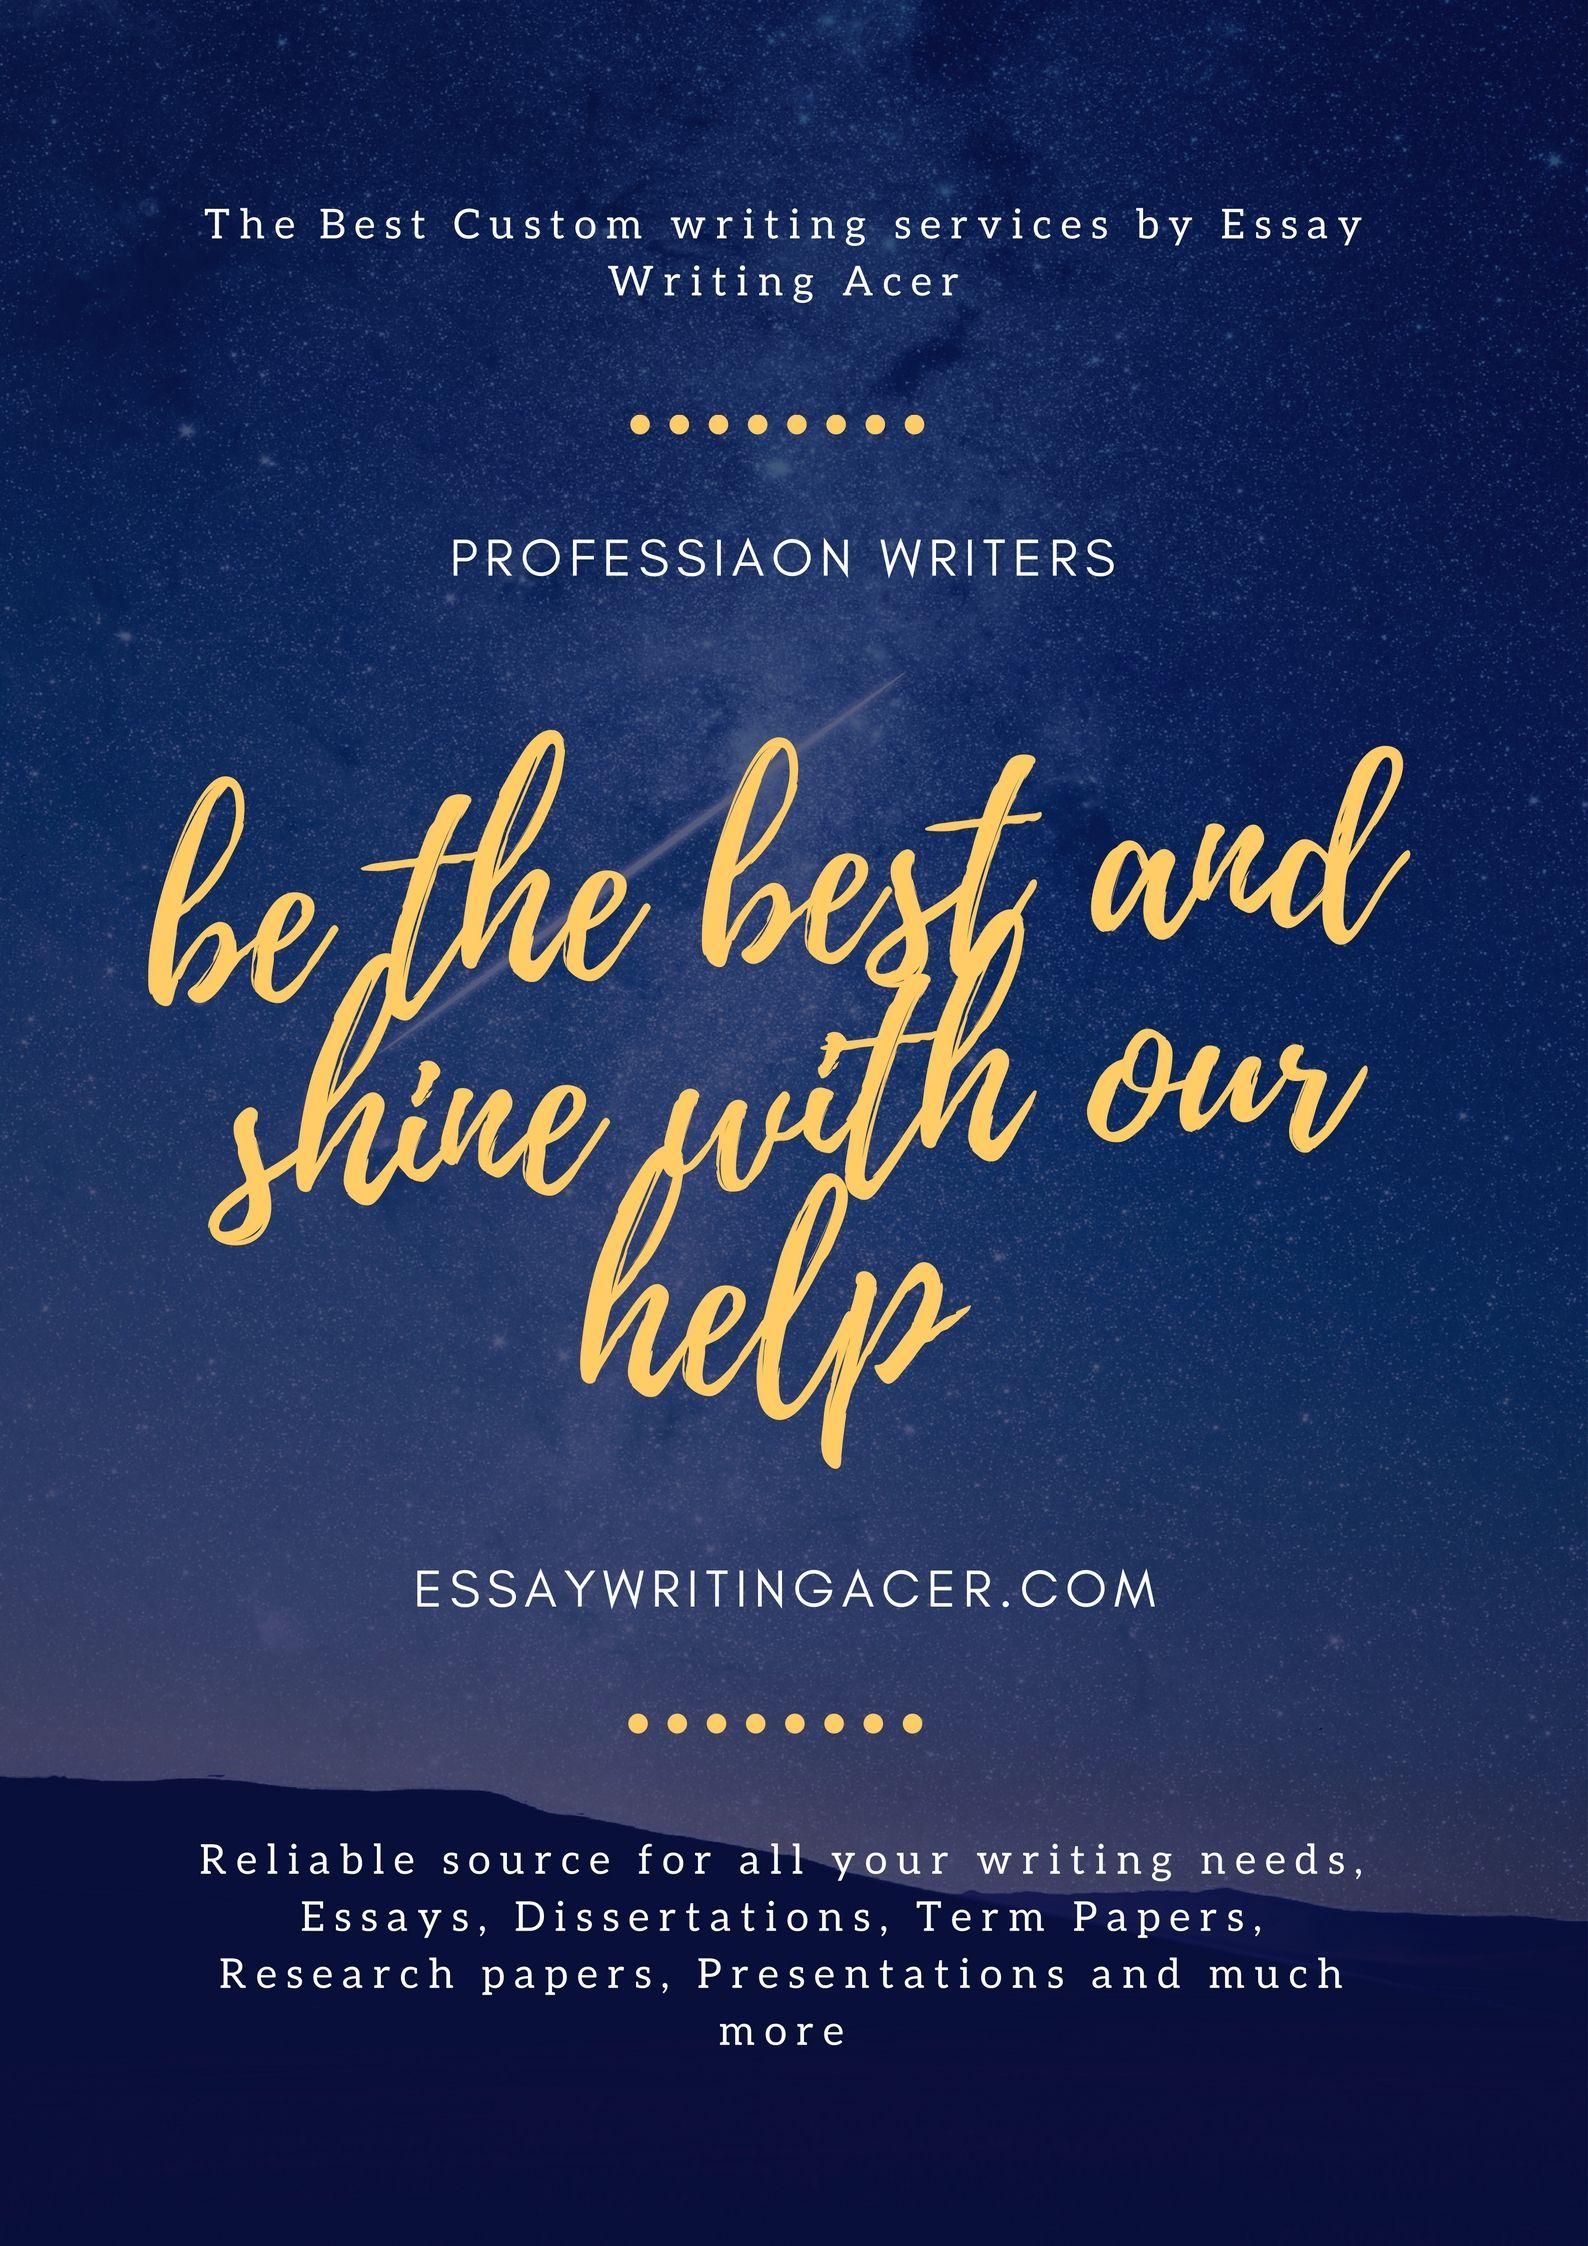 The best custom essay writing service